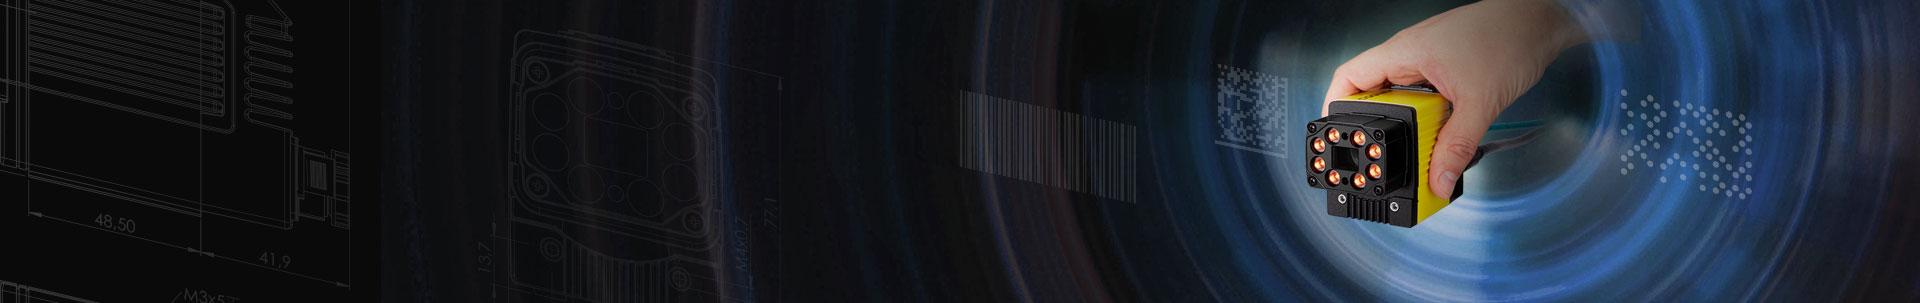 DataMan 470 Series Fixed-Mount Barcode Reader